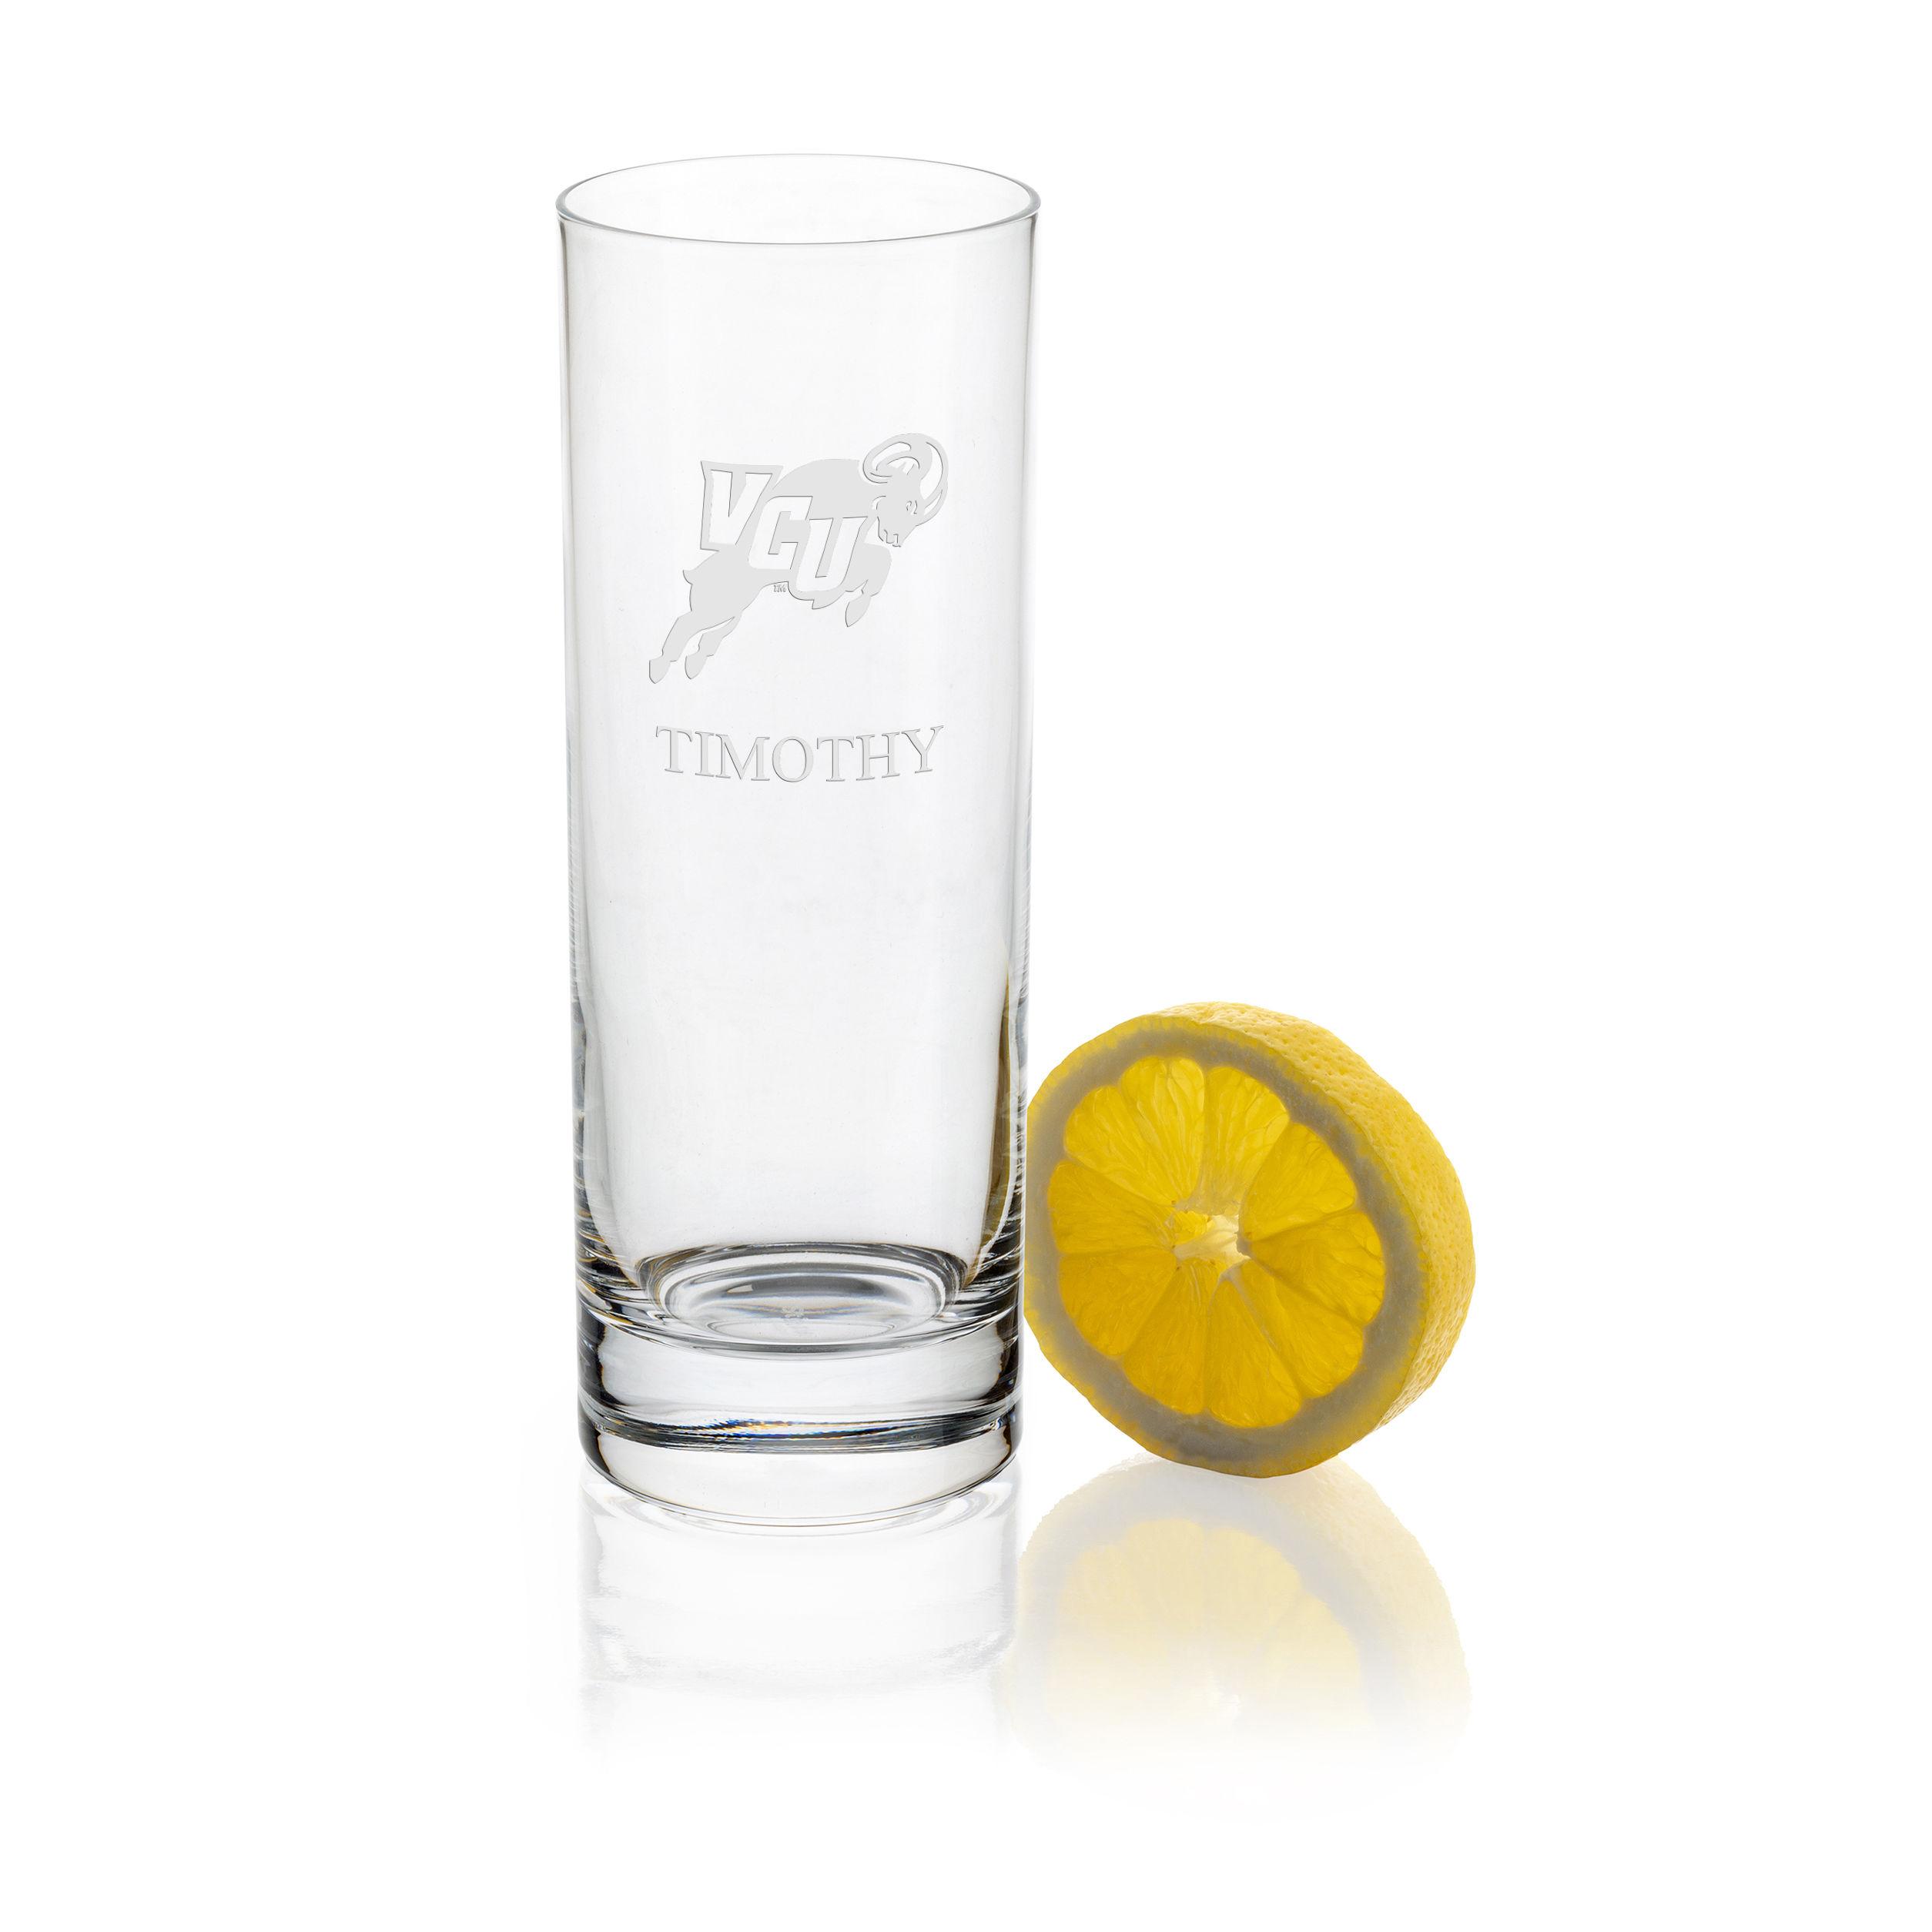 Virginia Commonwealth University Iced Beverage Glasses - Set of 4